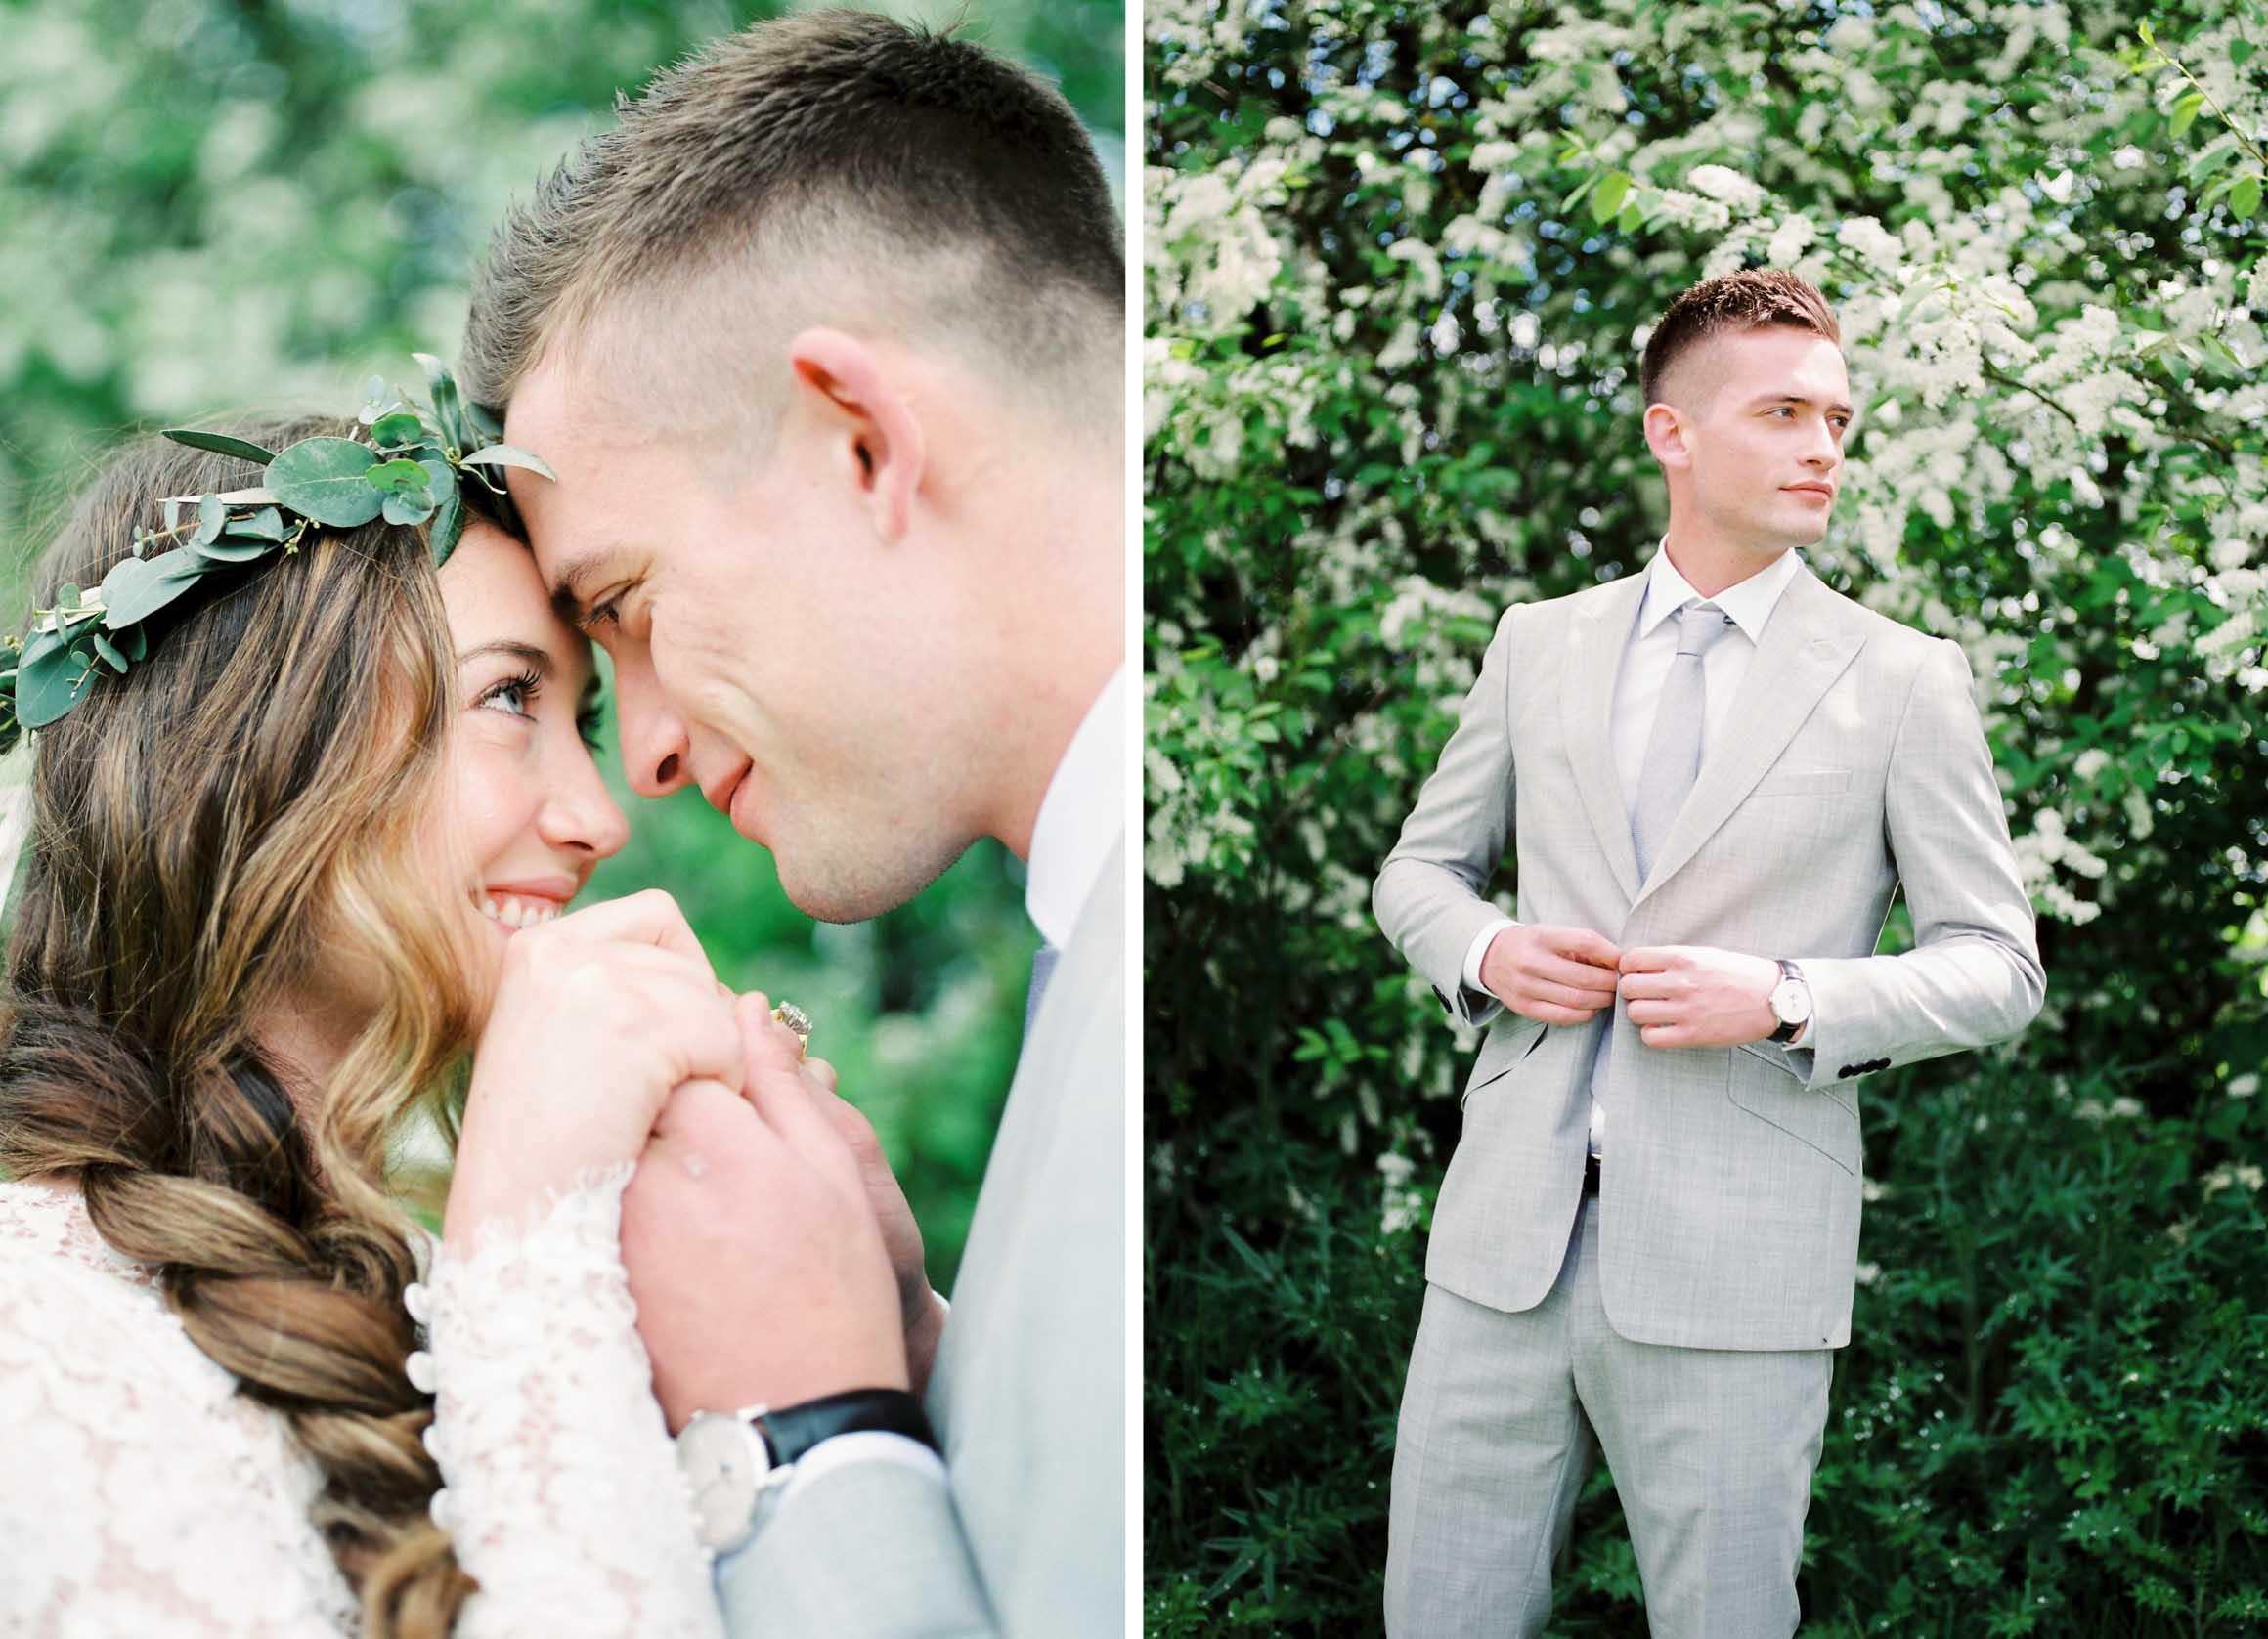 Amy O'Boyle Photography- Destination & UK Fine Art Film Wedding Photographer- Stubton Hall Wedding Shoot 9.jpg